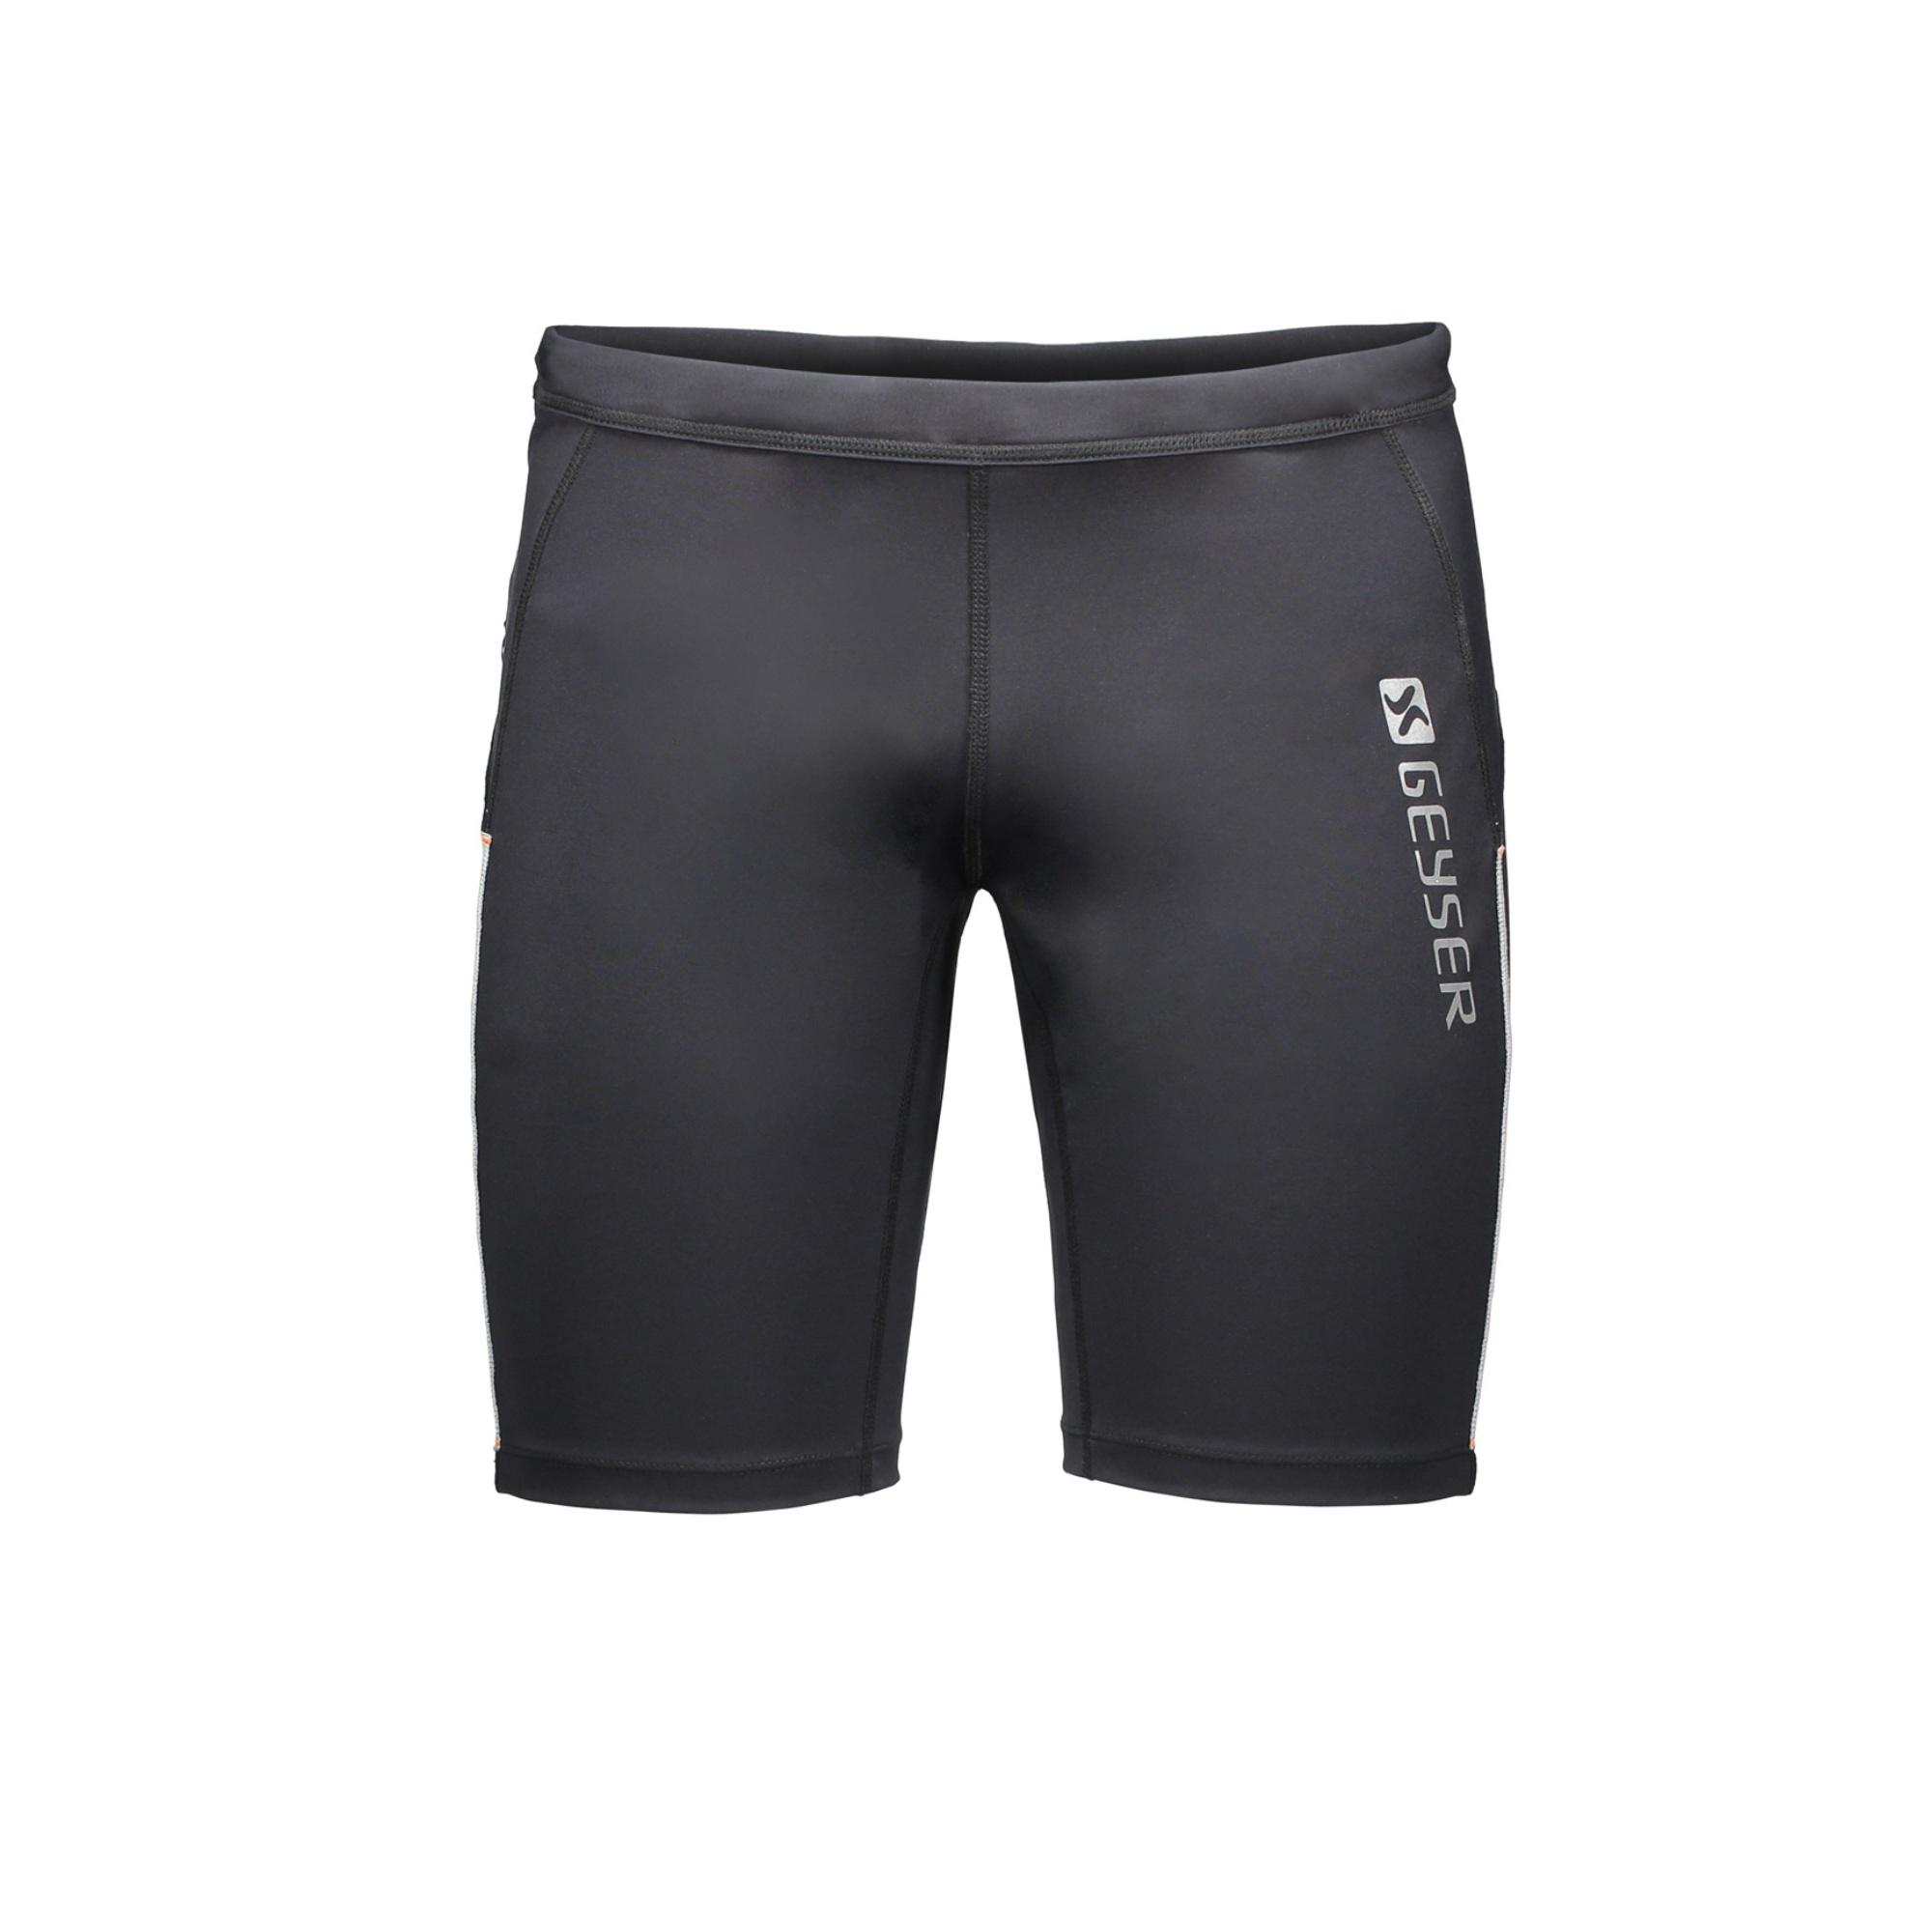 ID - - Geyser - Pantaloncini corti sportivi - ID Unisex/Adulti (ID440) 867ed2